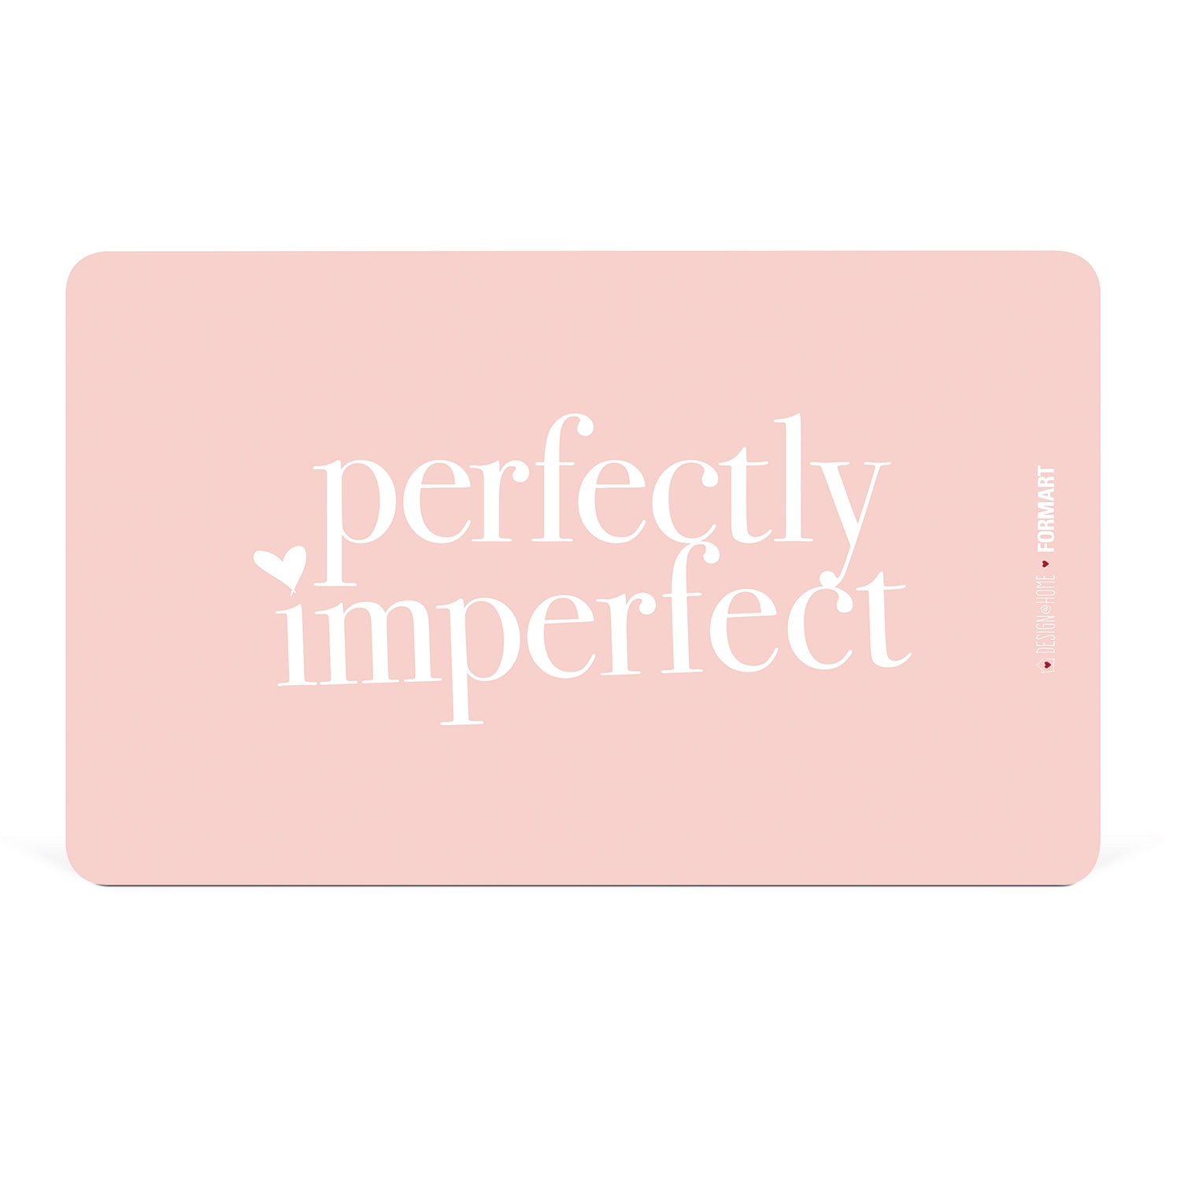 Frühstücks-Brettchen - Perfectly Imperfect Tray D@H